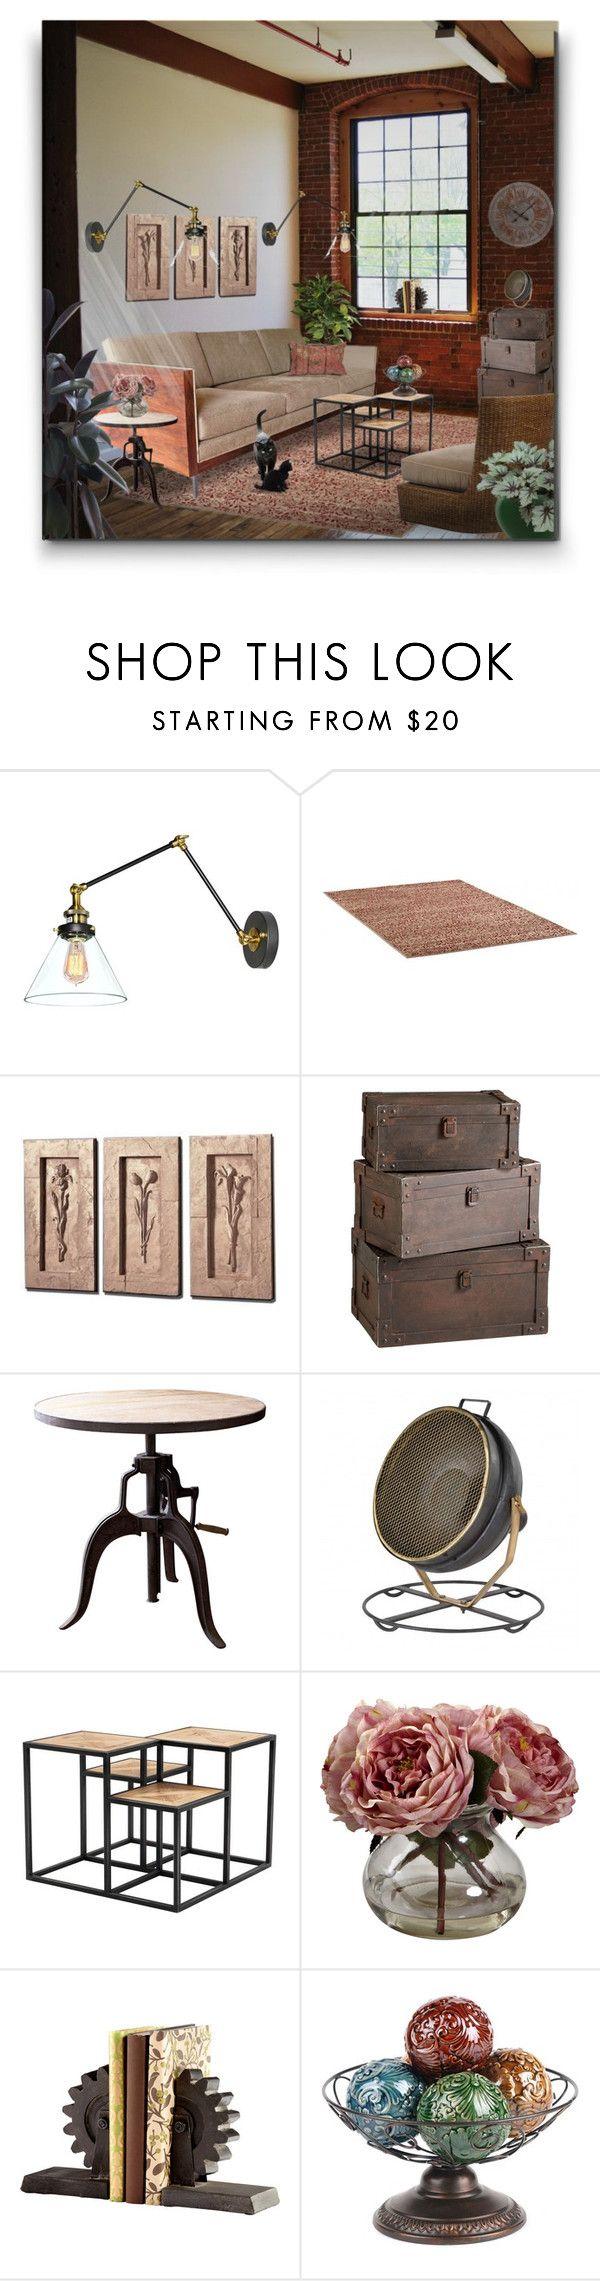 268 best industrial look images on pinterest | home, design homes